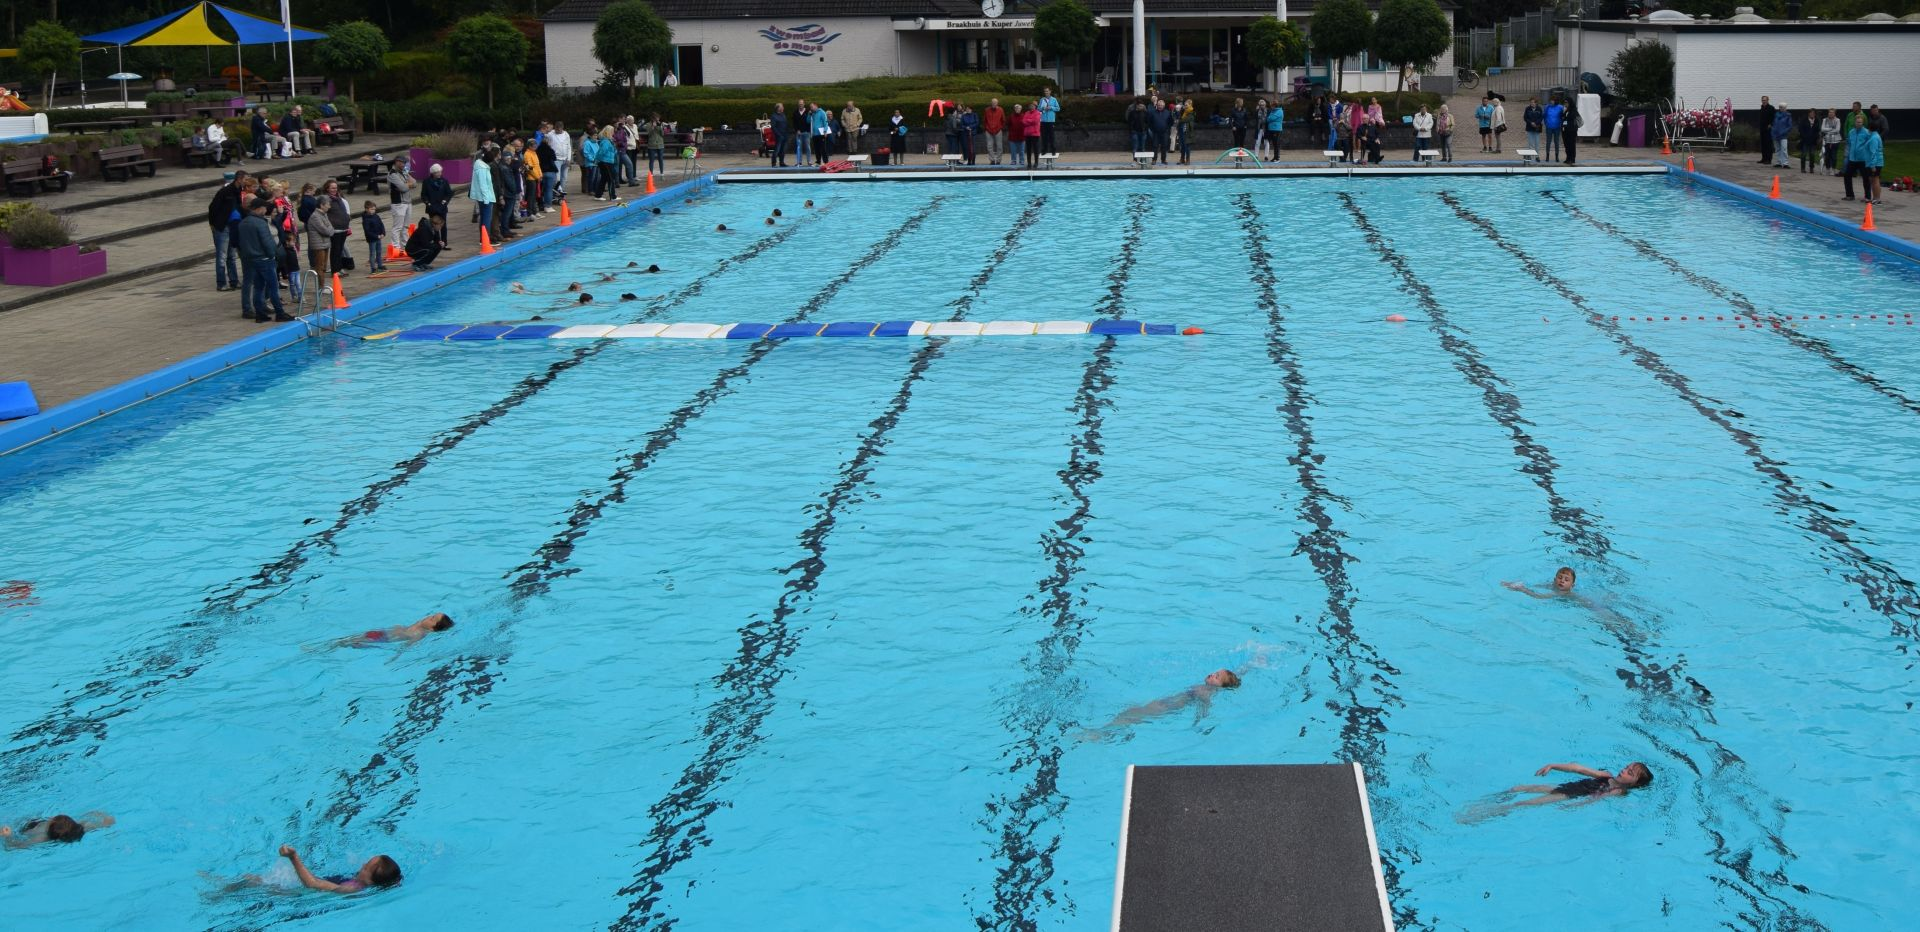 Feestelijke afsluiting zwembad De Mors na teleurstellende zomer